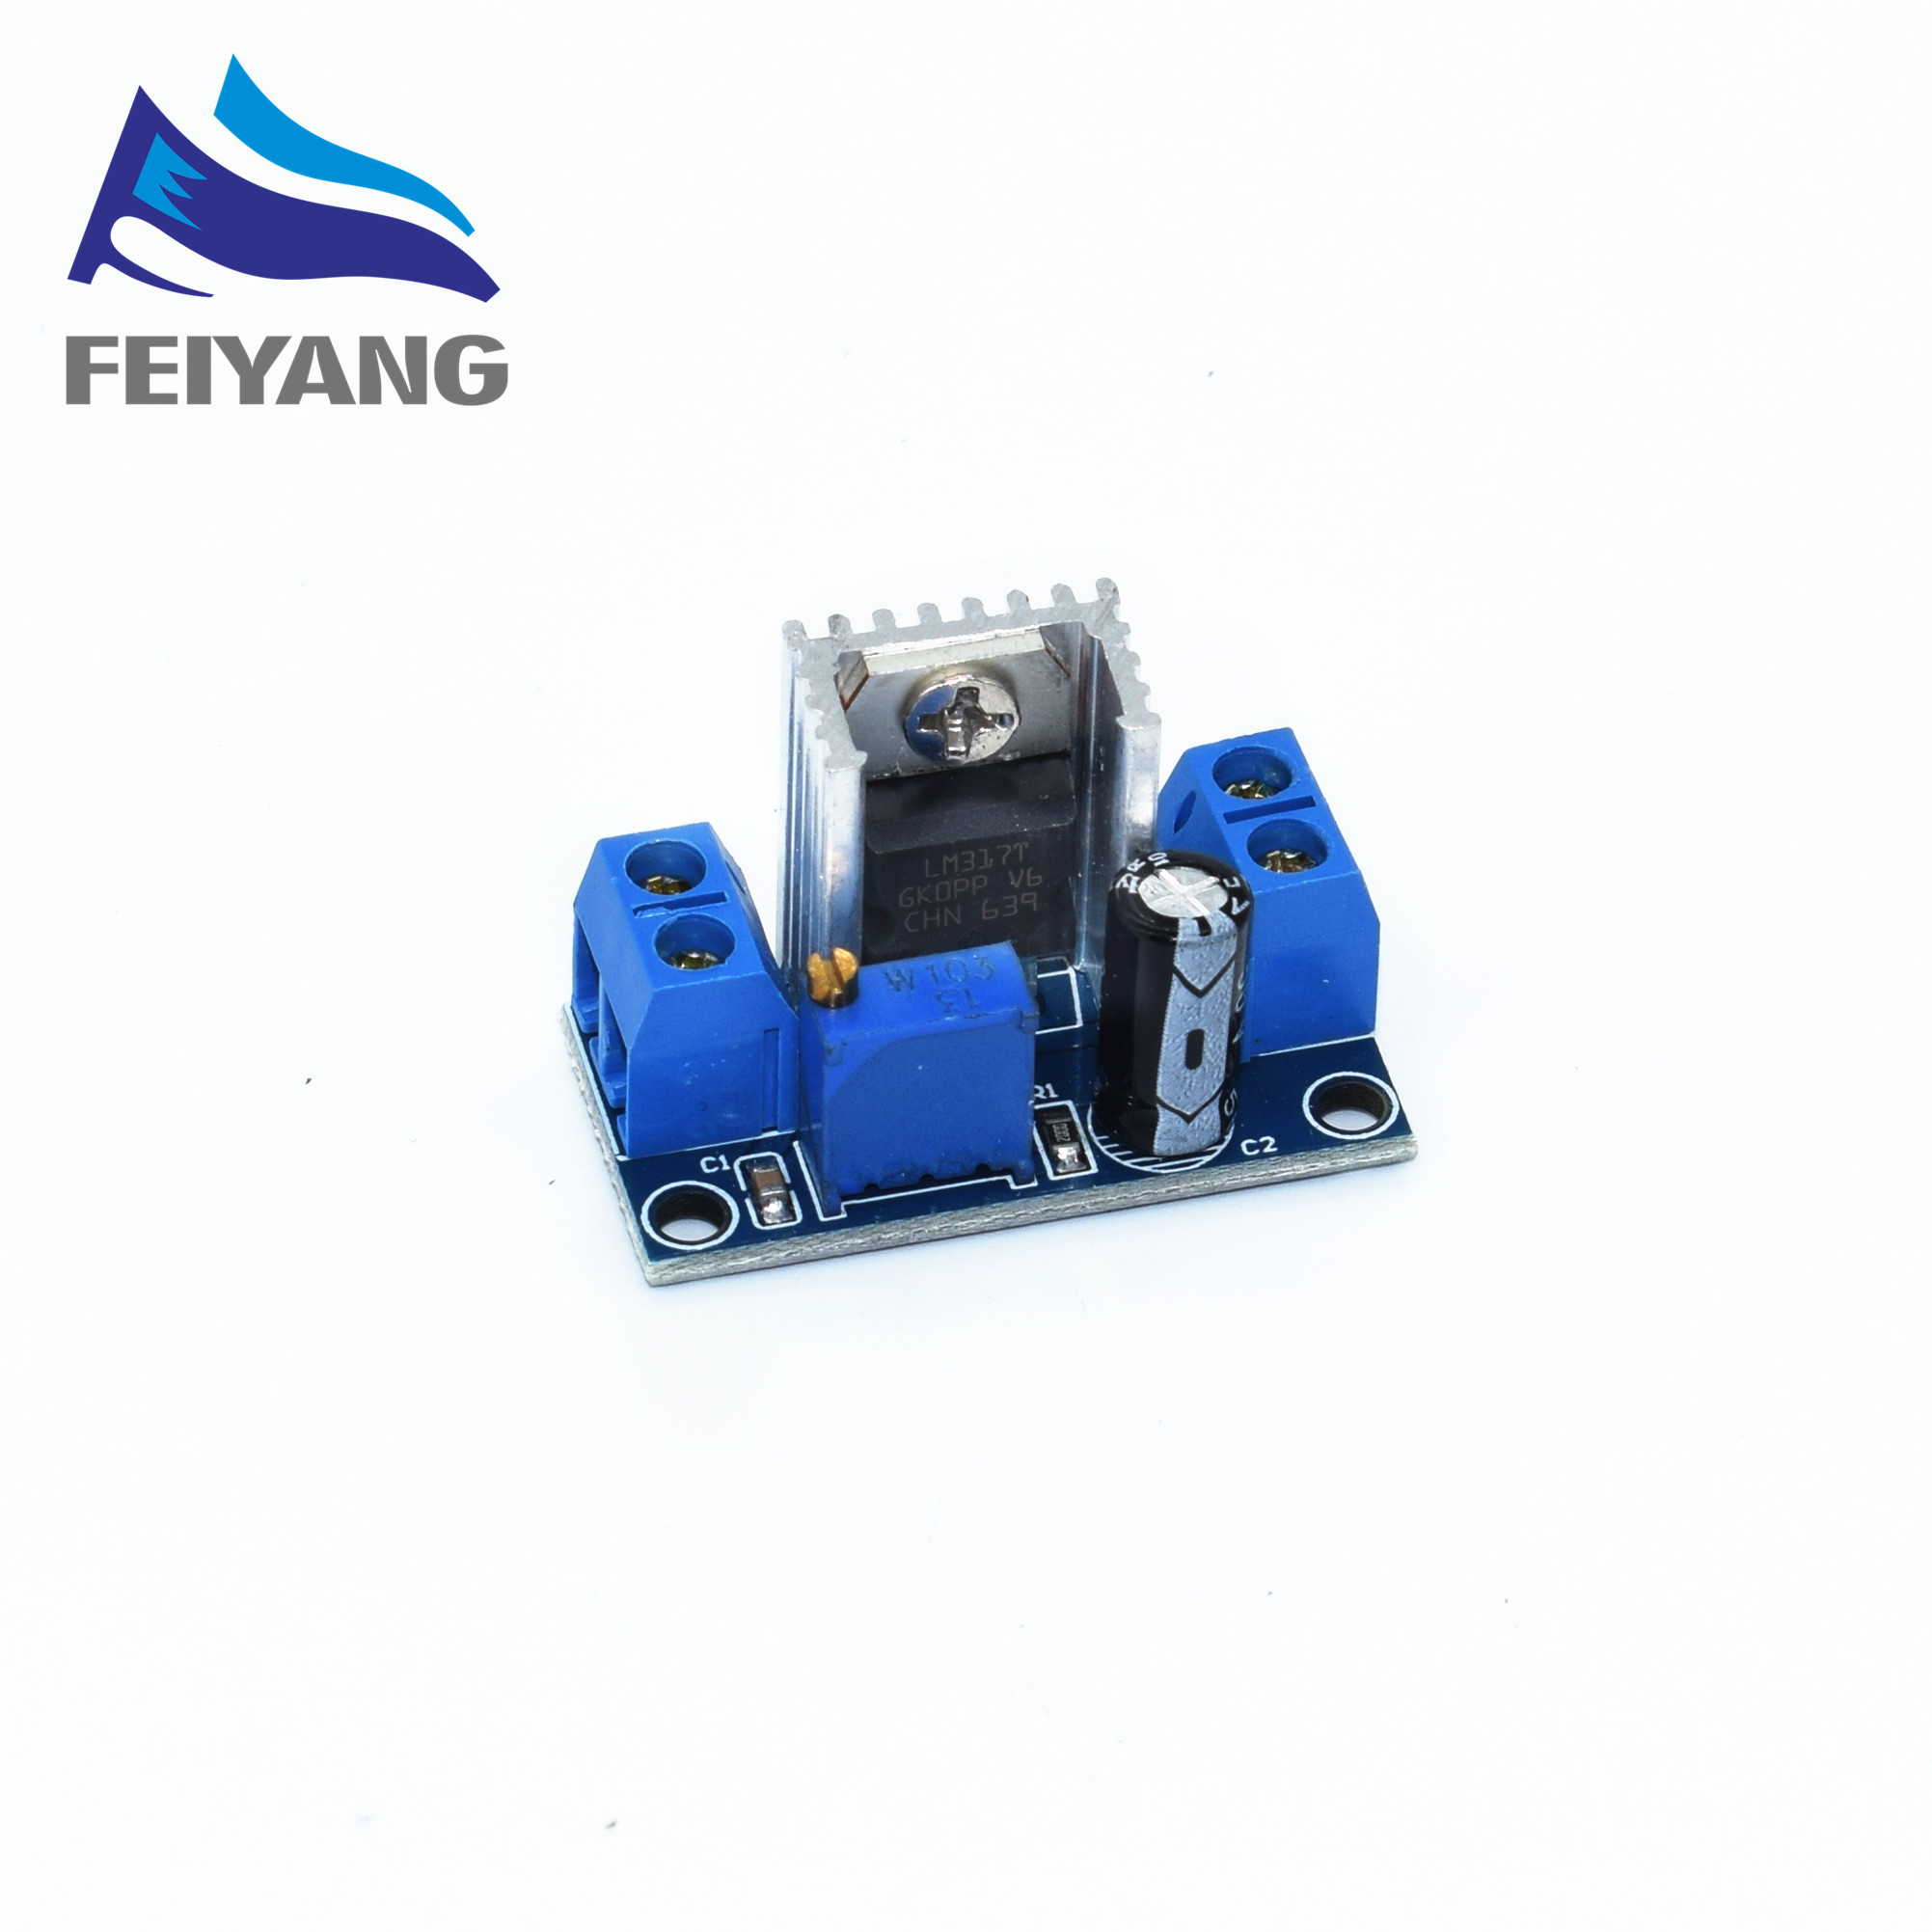 100PCS LM317 Adjustable Voltage Regulator Power Supply DC-DC Converter Buck Step Down Circuit Board Module Linear Regulator 1